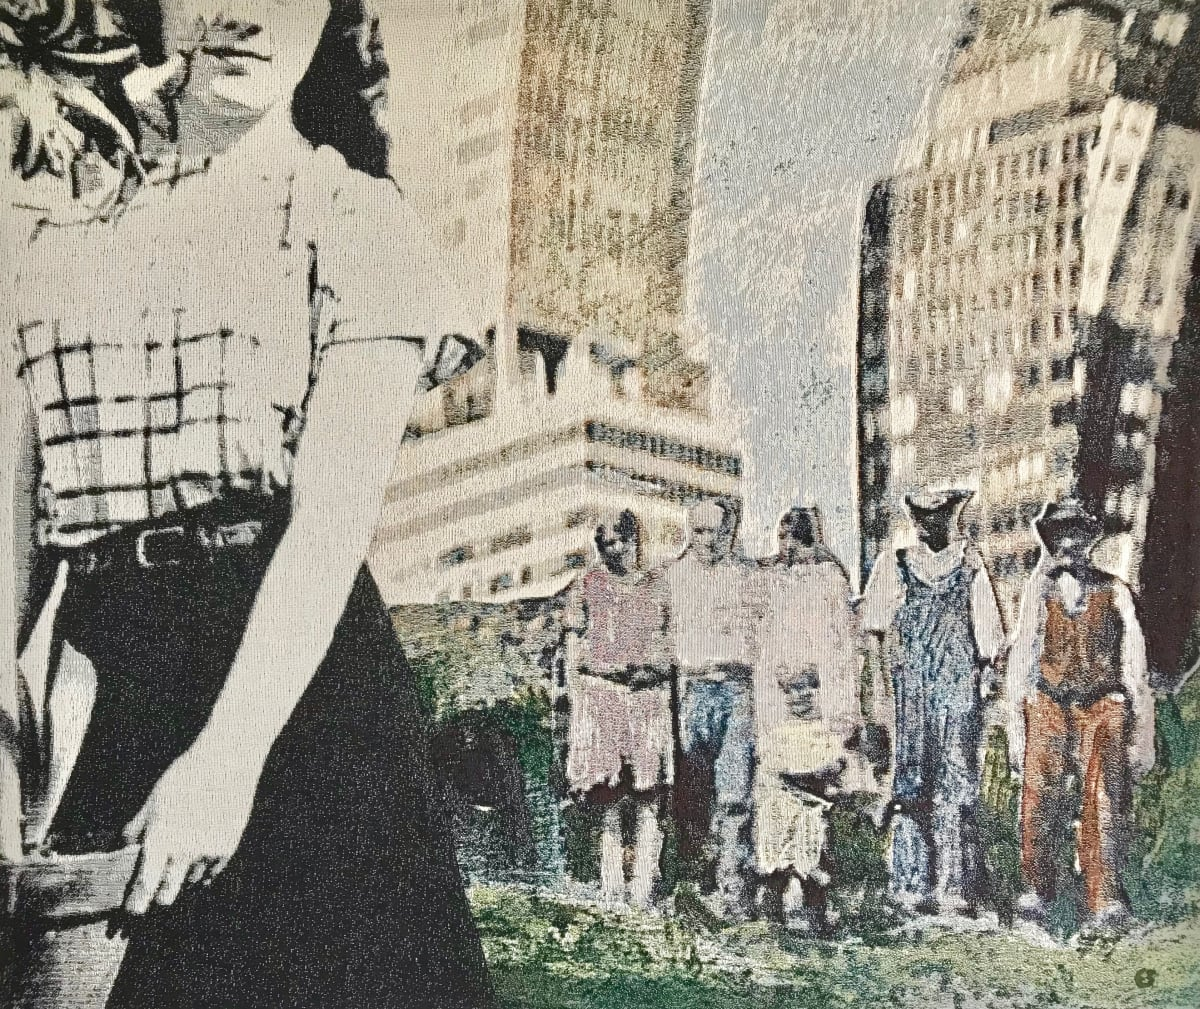 Elizabeth Stewart, The Uprooted , 2018